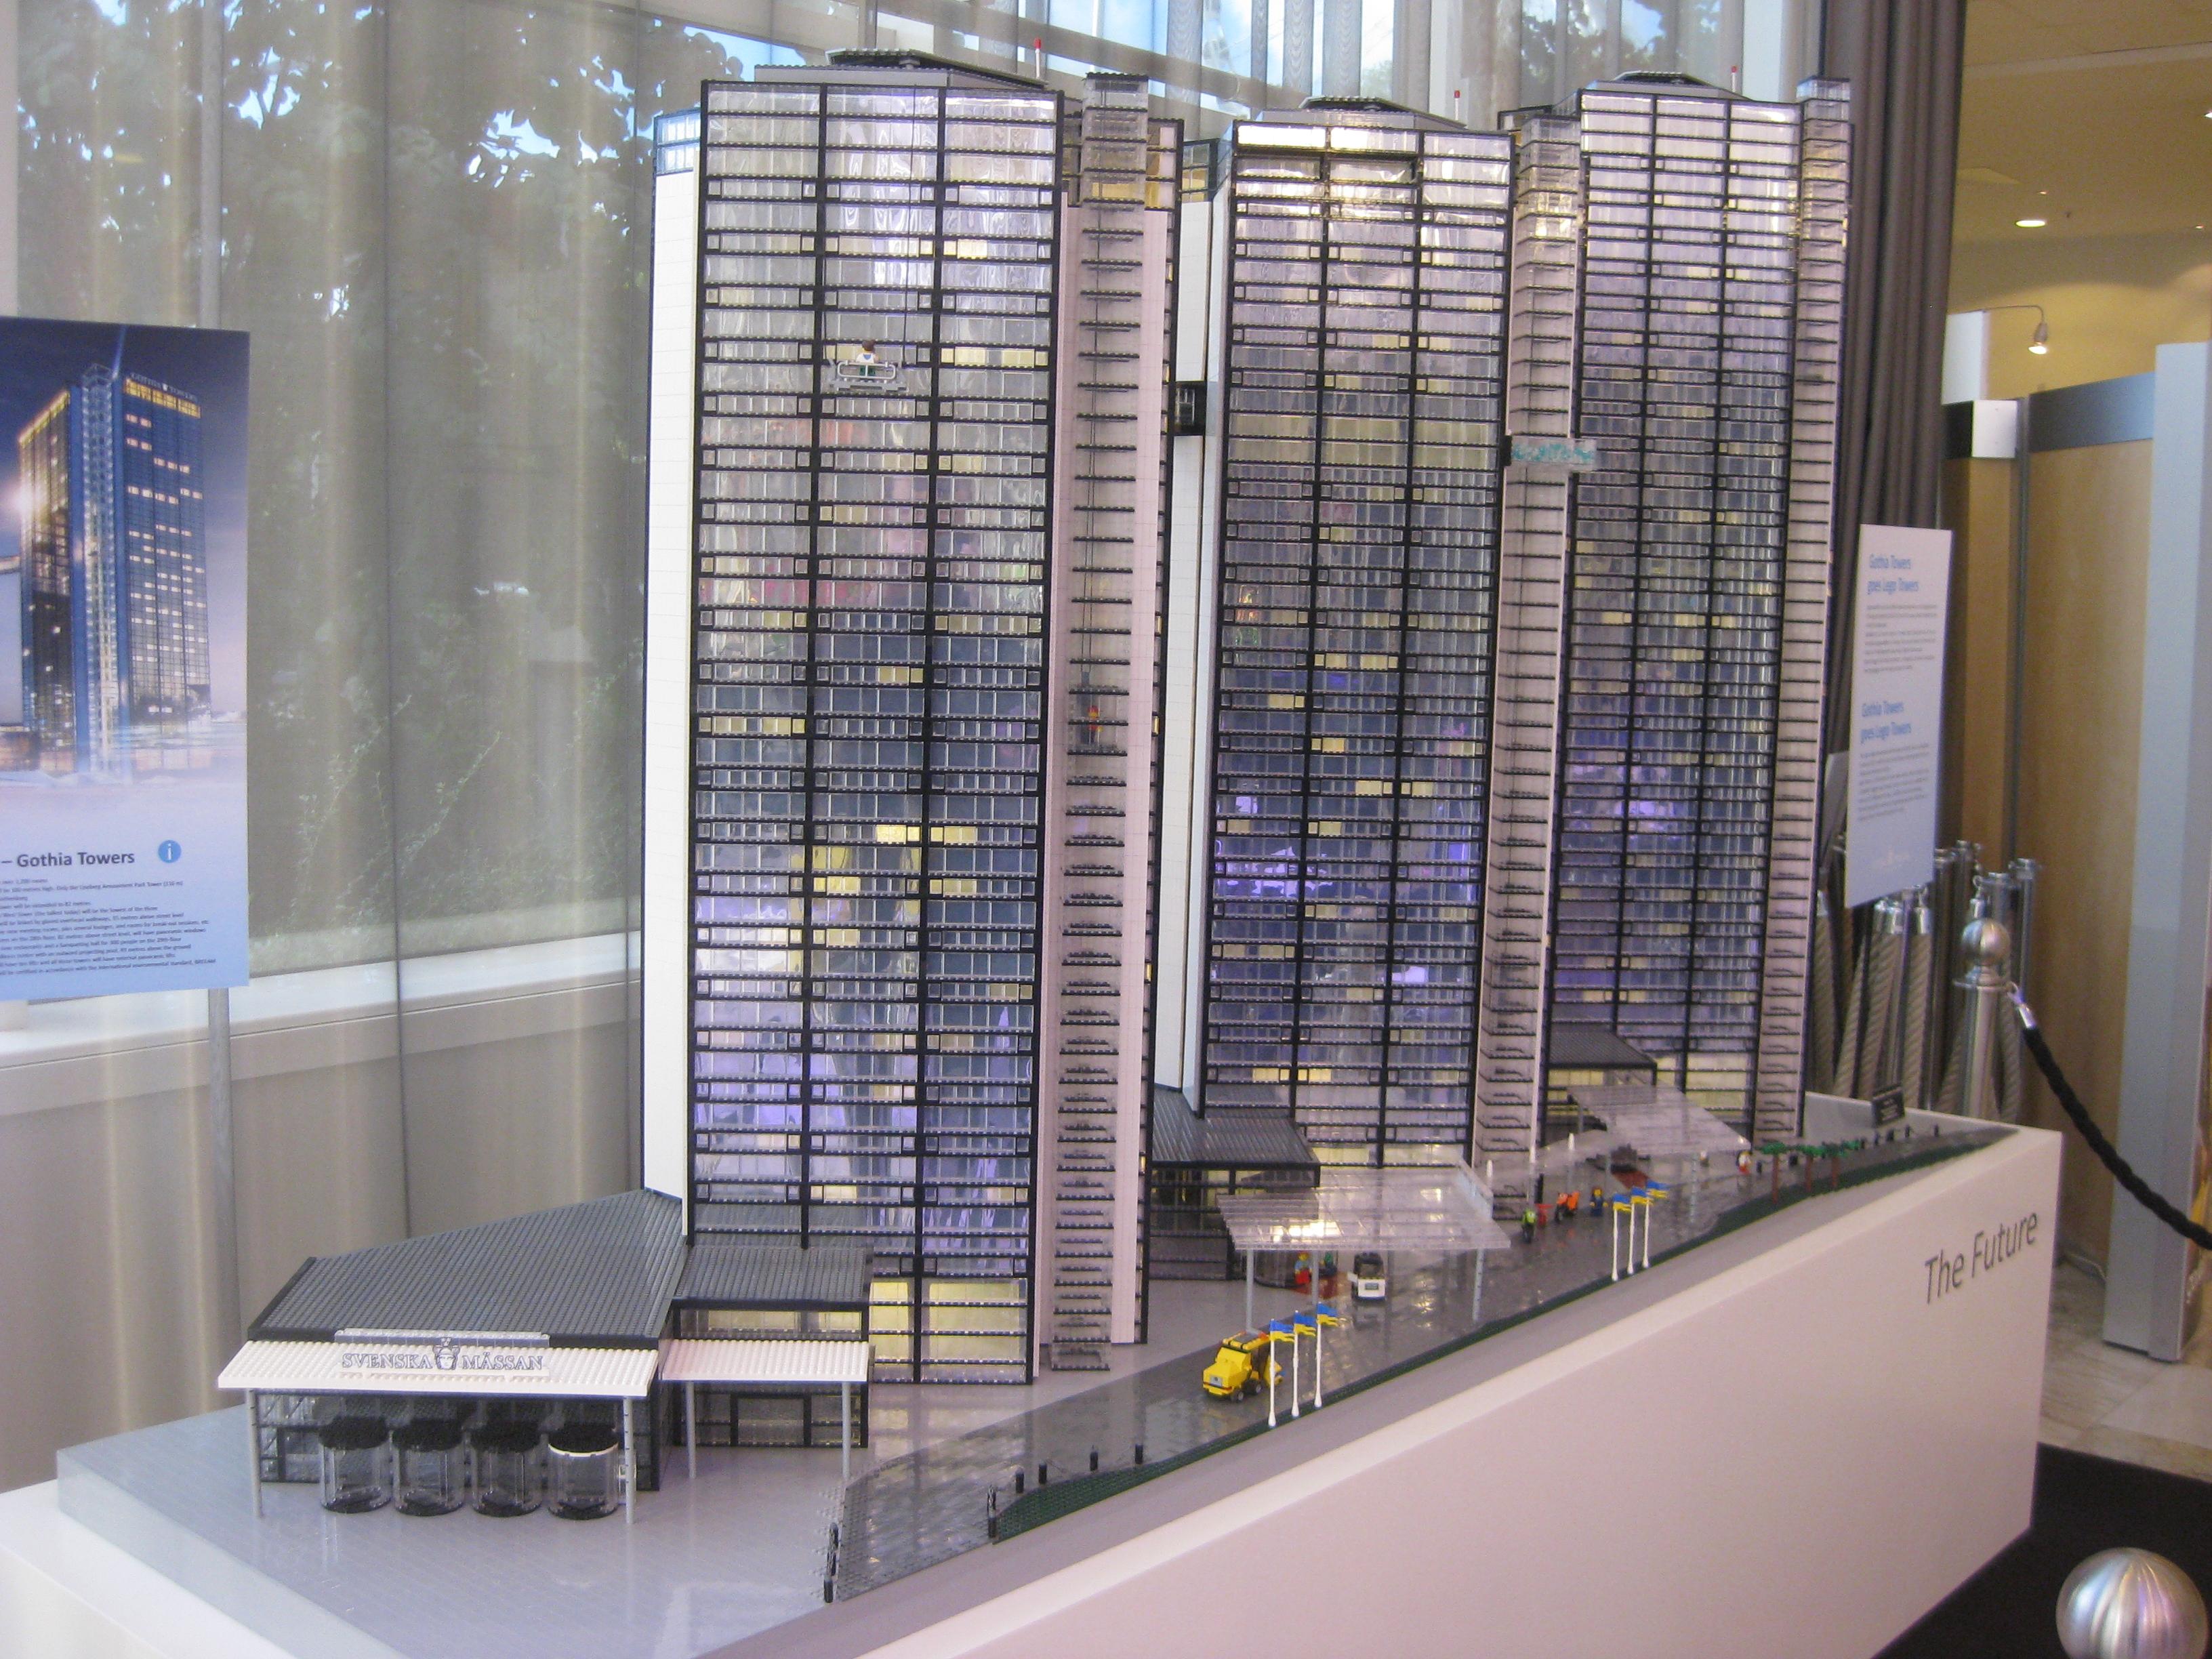 File:Gothia Towers in Lego 08.JPG - Wikimedia Commons